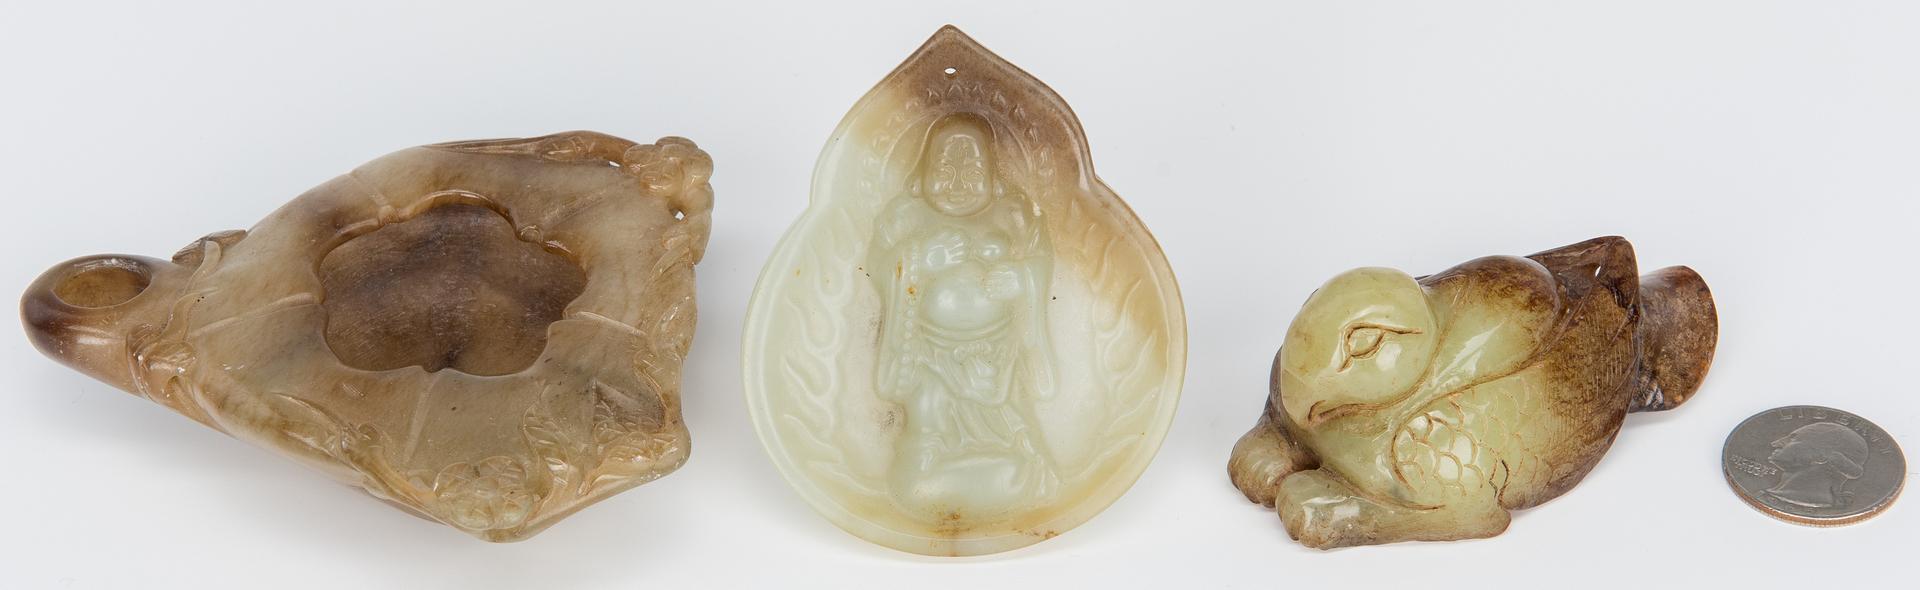 Lot 324: 3 Chinese Jade Items, incl. Buddha, Brush Pot & Bird